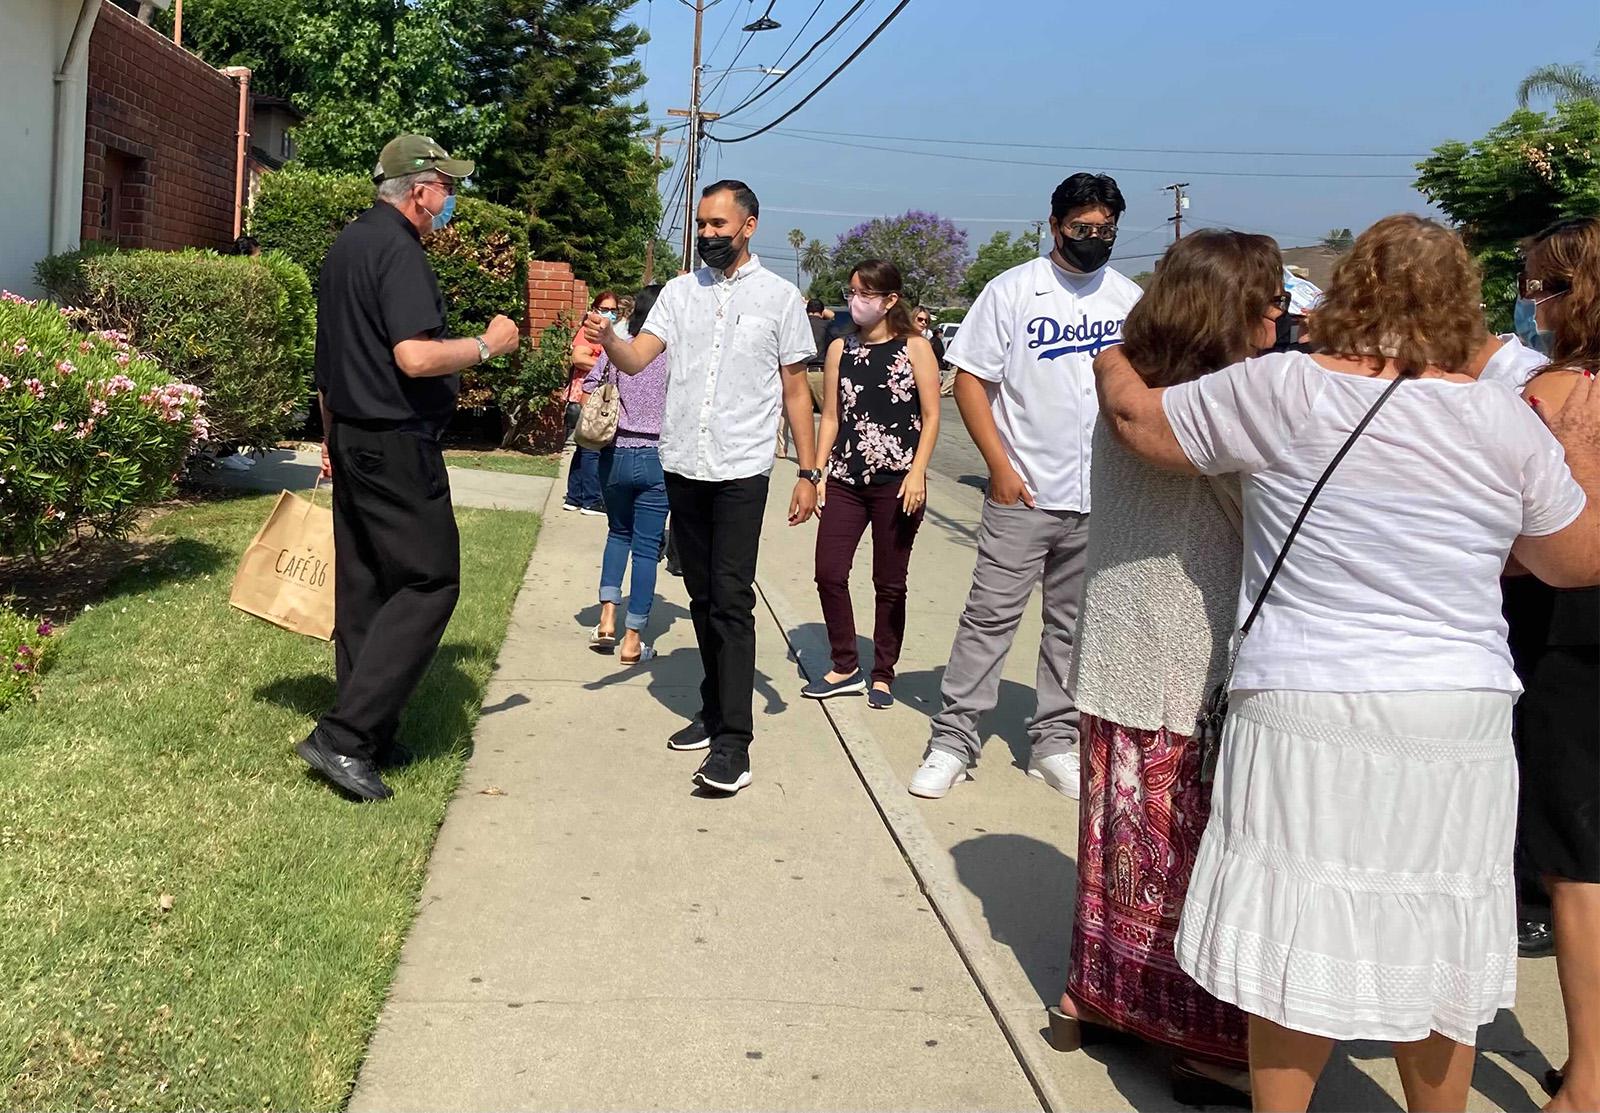 The Rev. Austin Doran, left, fist bumps a St. Anthony Catholic Church parishioner on Sunday, June 20, 2021, in San Gabriel, California. RNS photo by Alejandra Molina